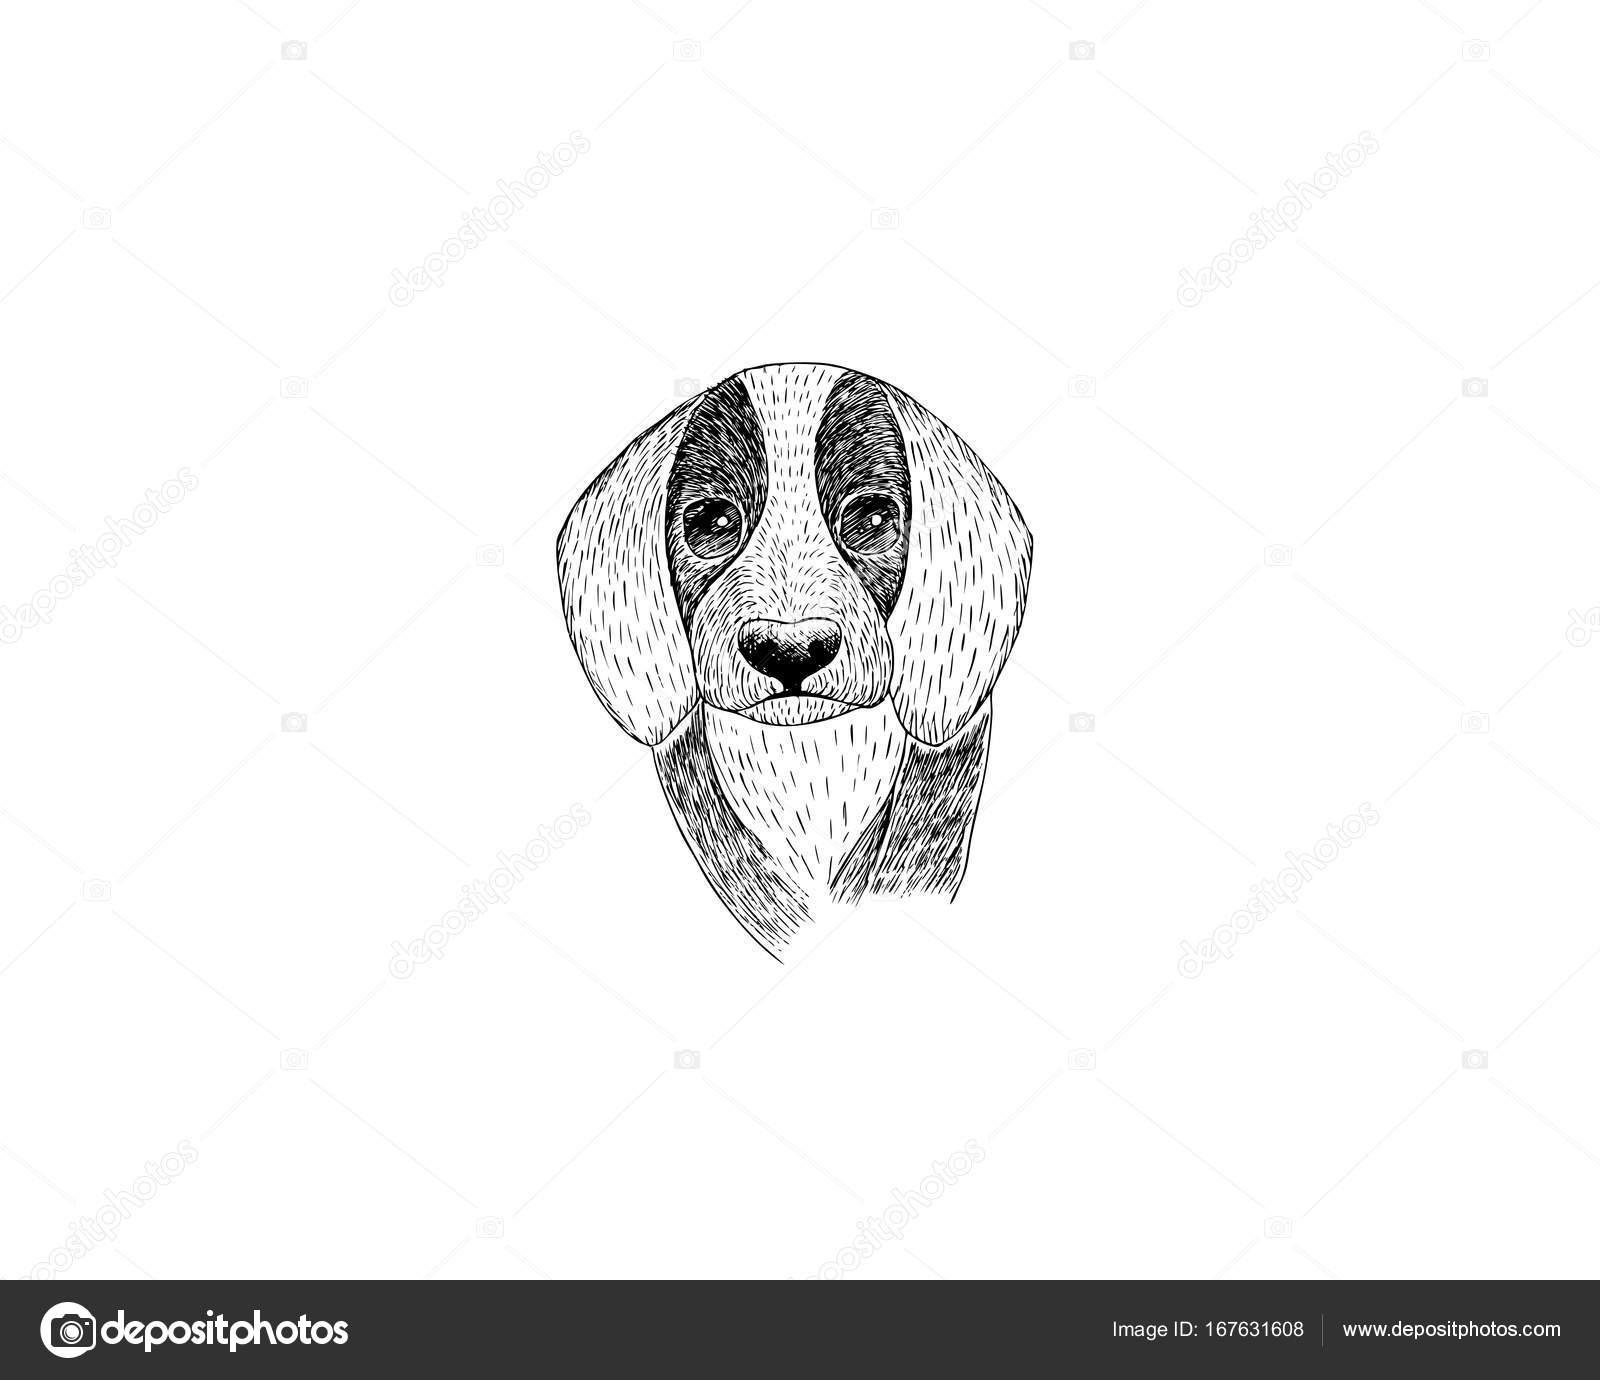 Dibujos A Carboncillo Para Imprimir Dibujo Ilustracion De Beagle